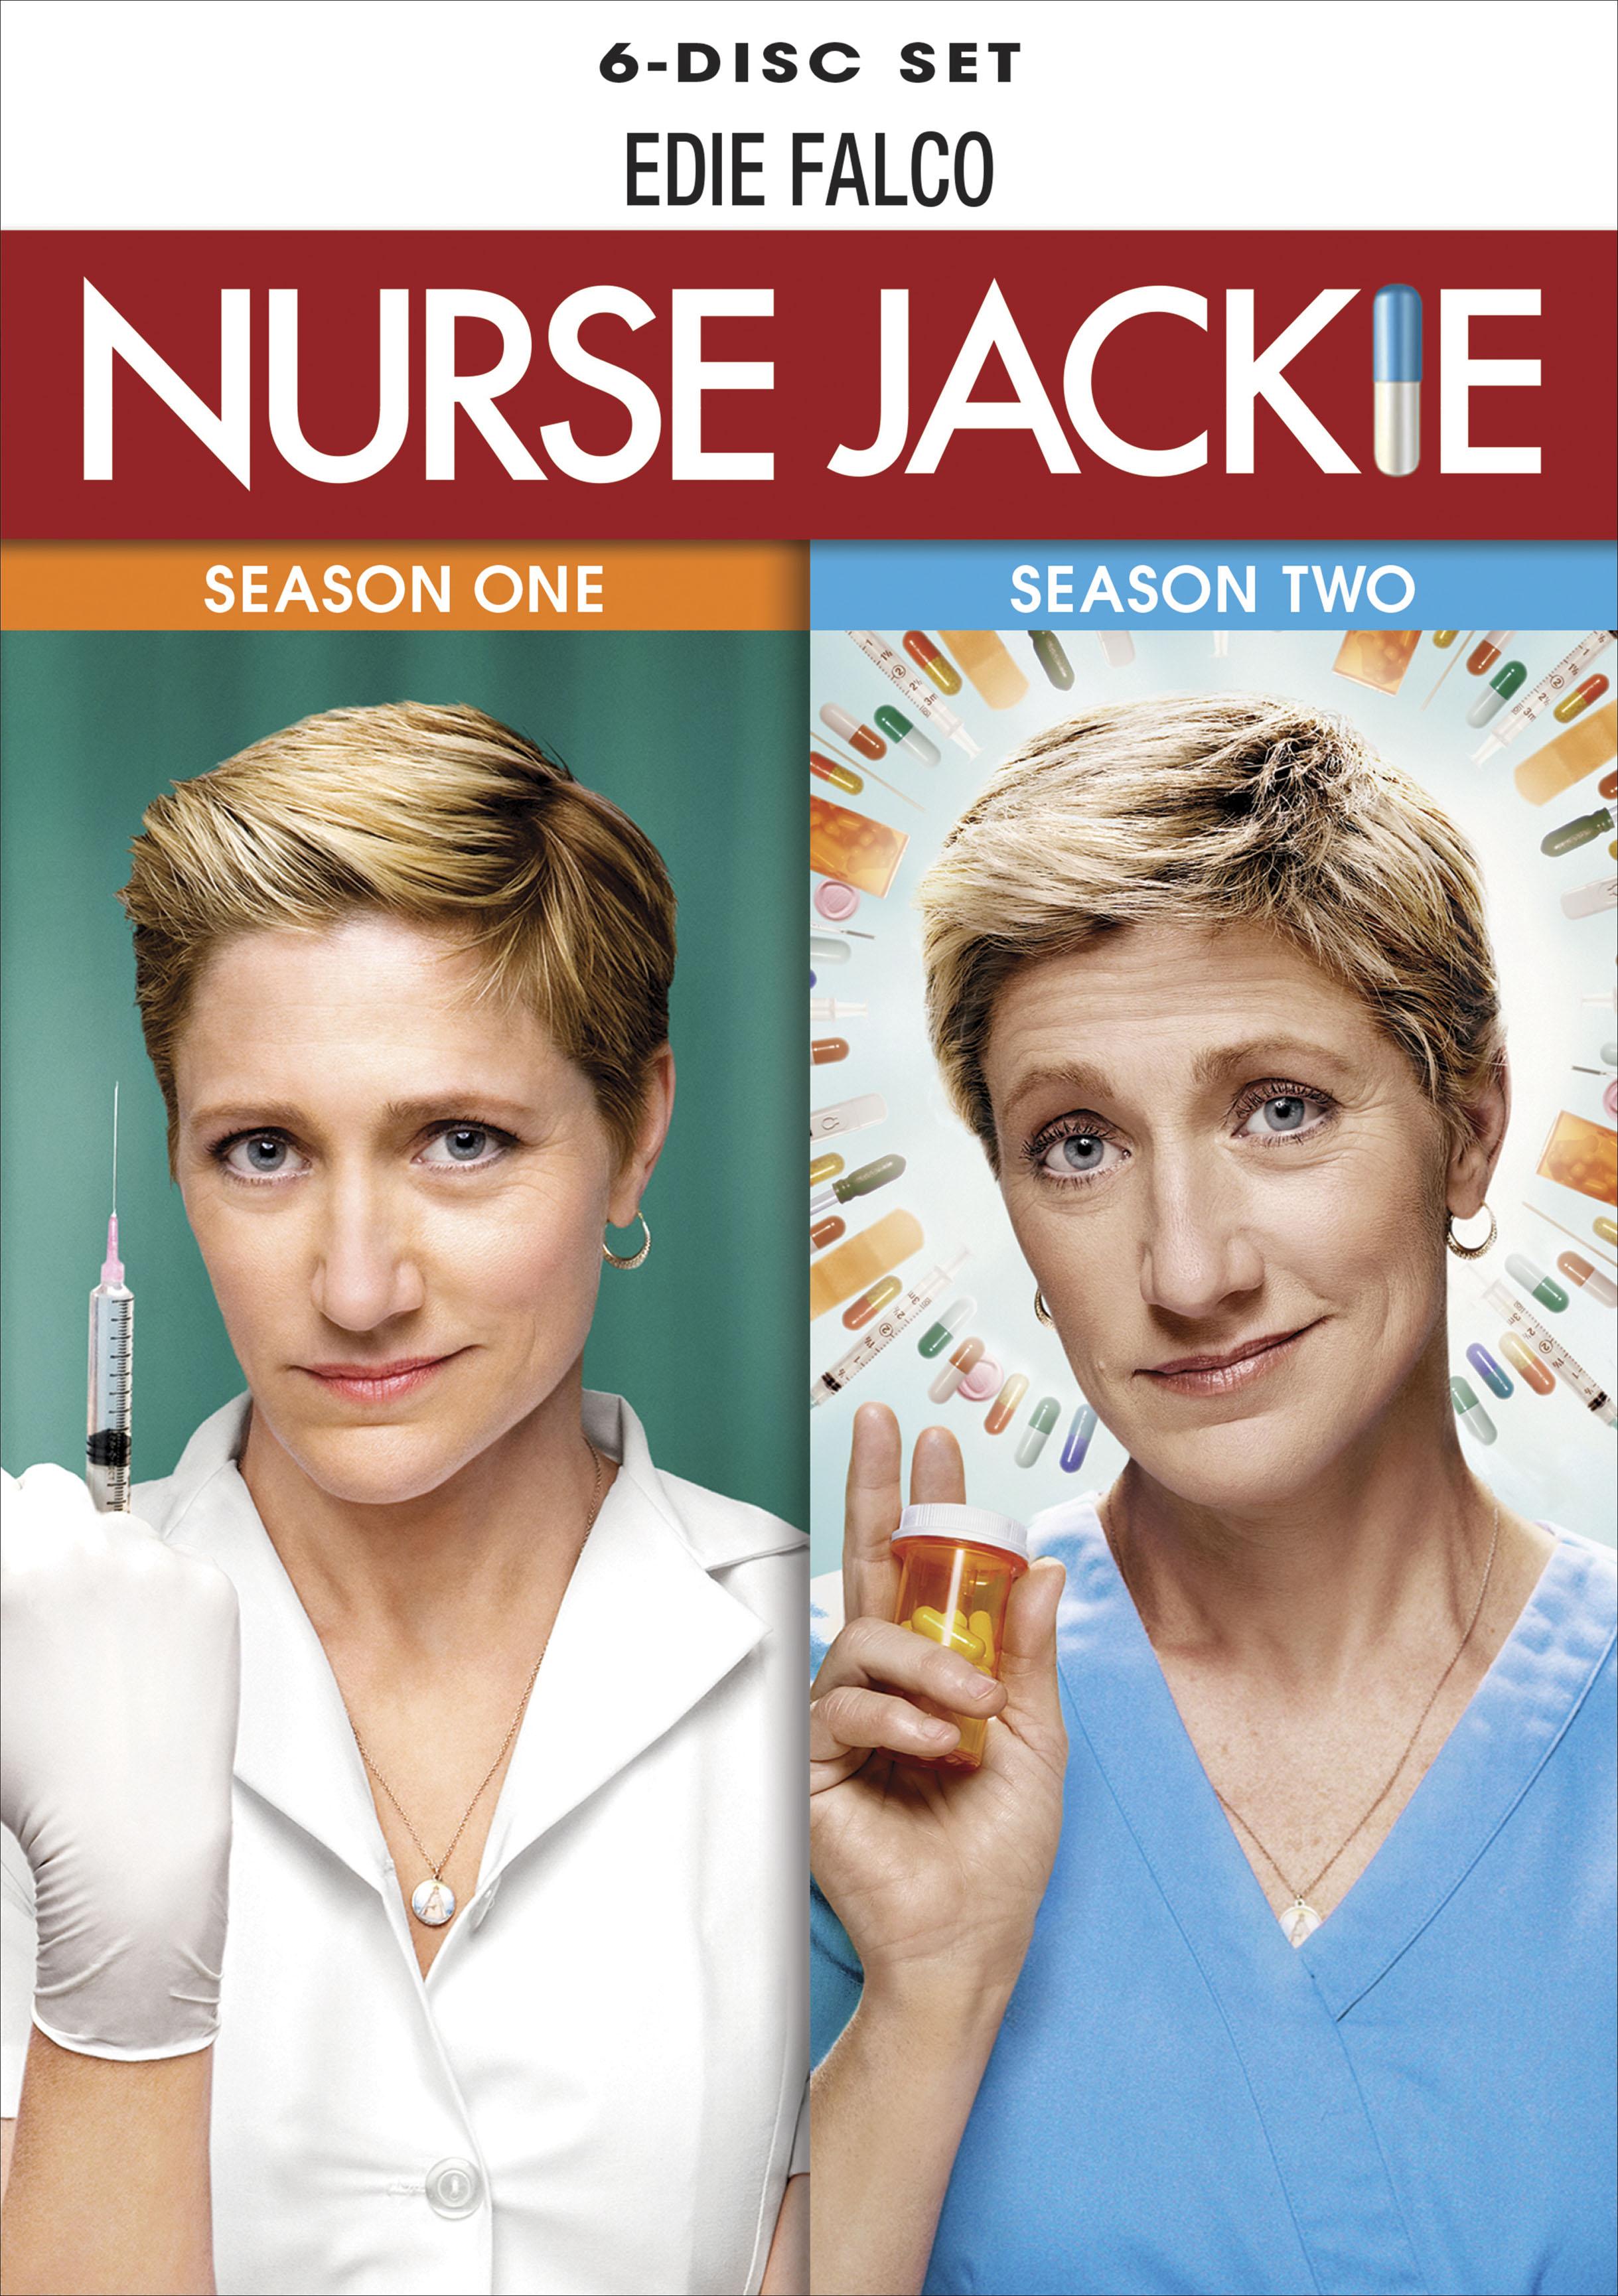 Nurse Jackie: Seasons 1 And 2 [6 Discs] (dvd) 5580964